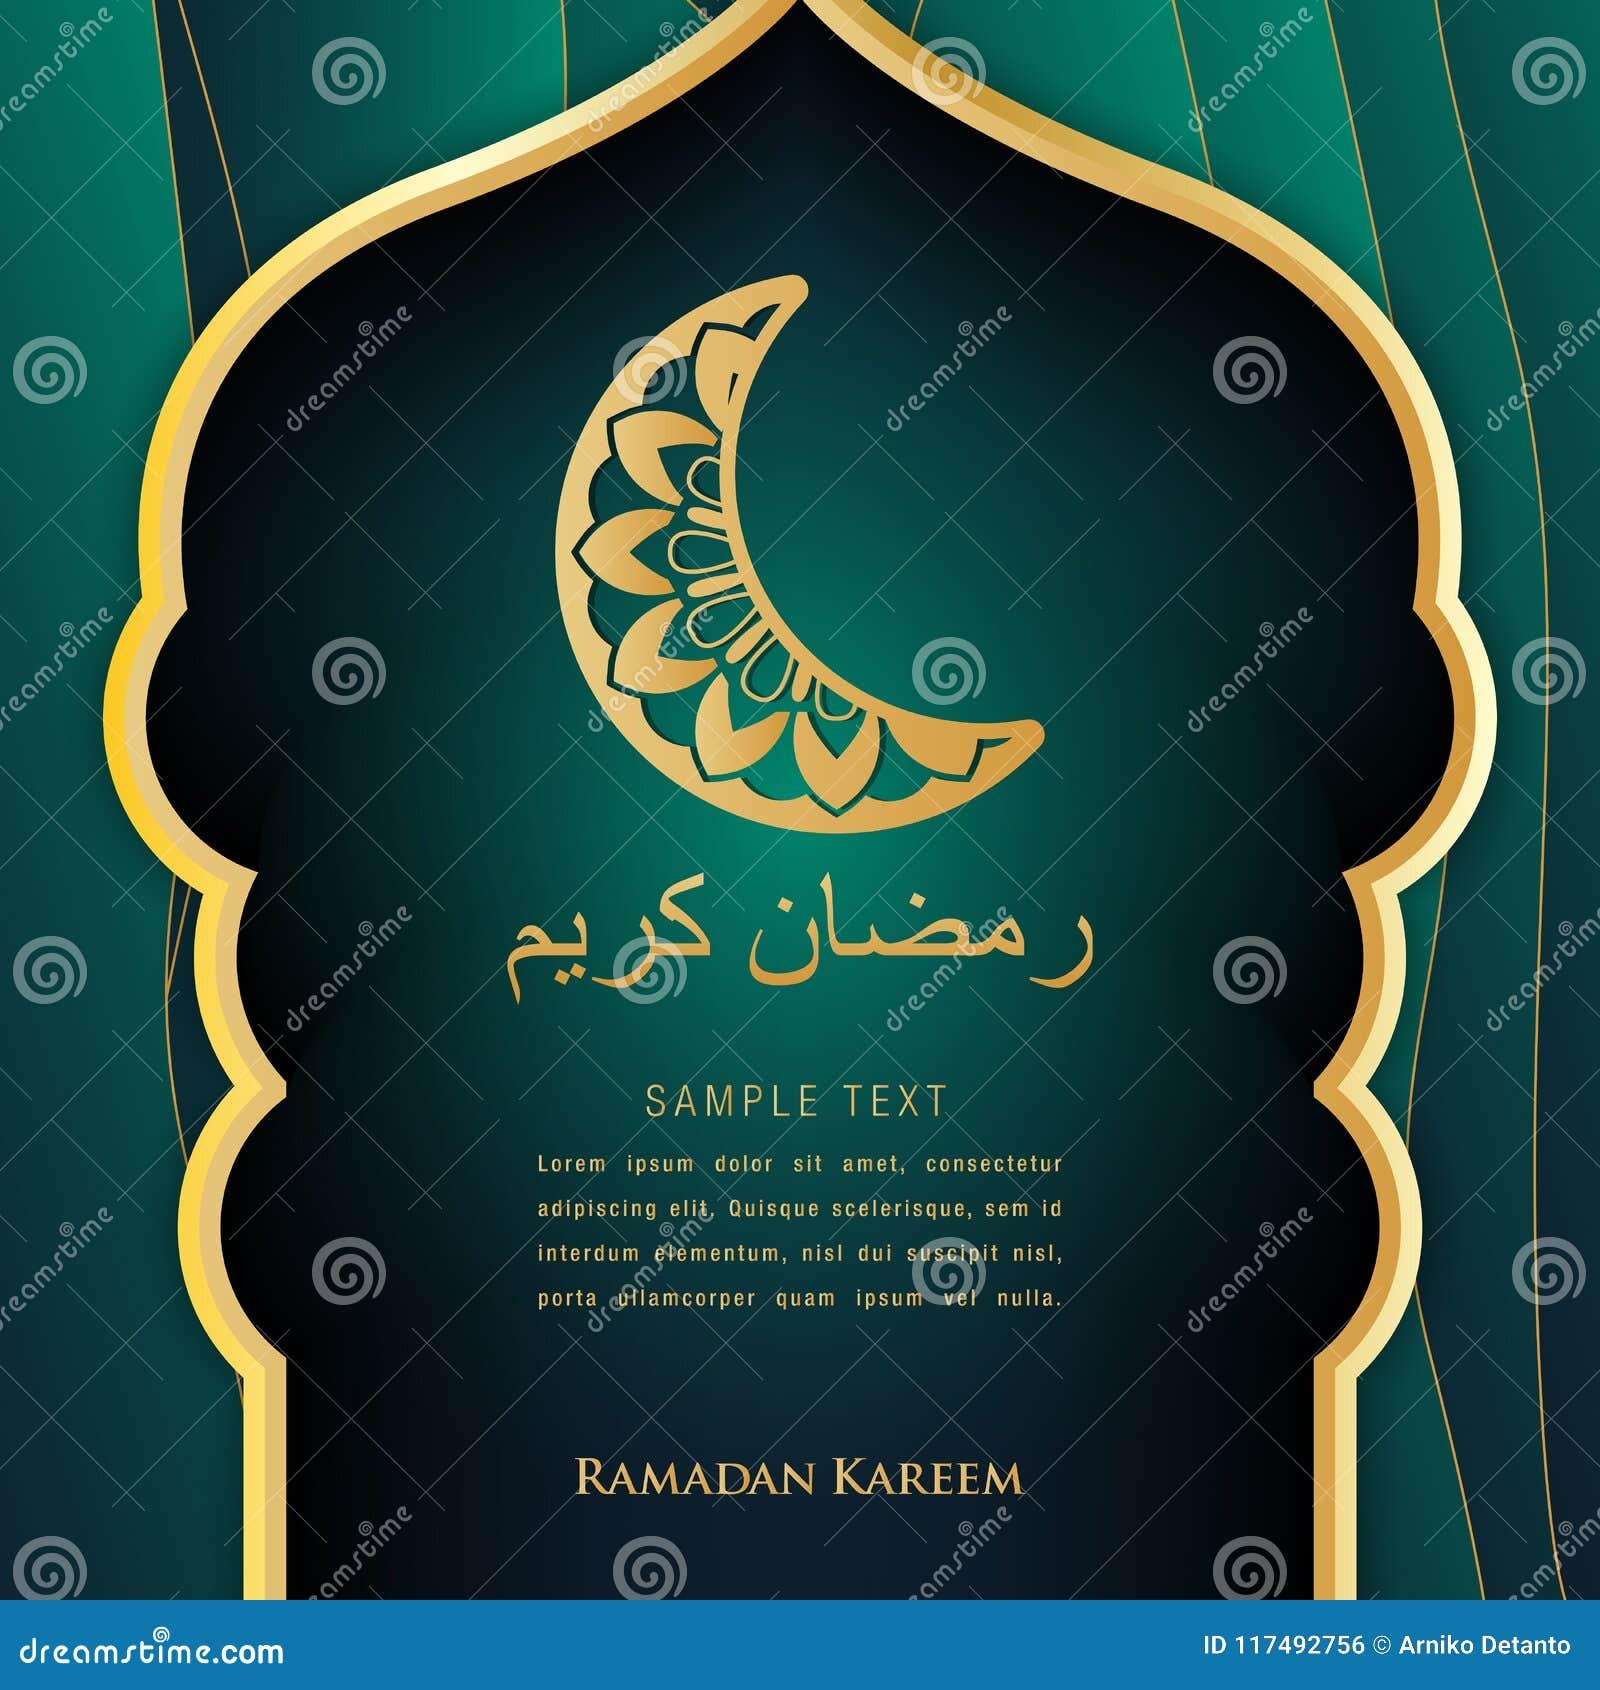 ramadan kareem islamic crescent moon islamic decoration stock